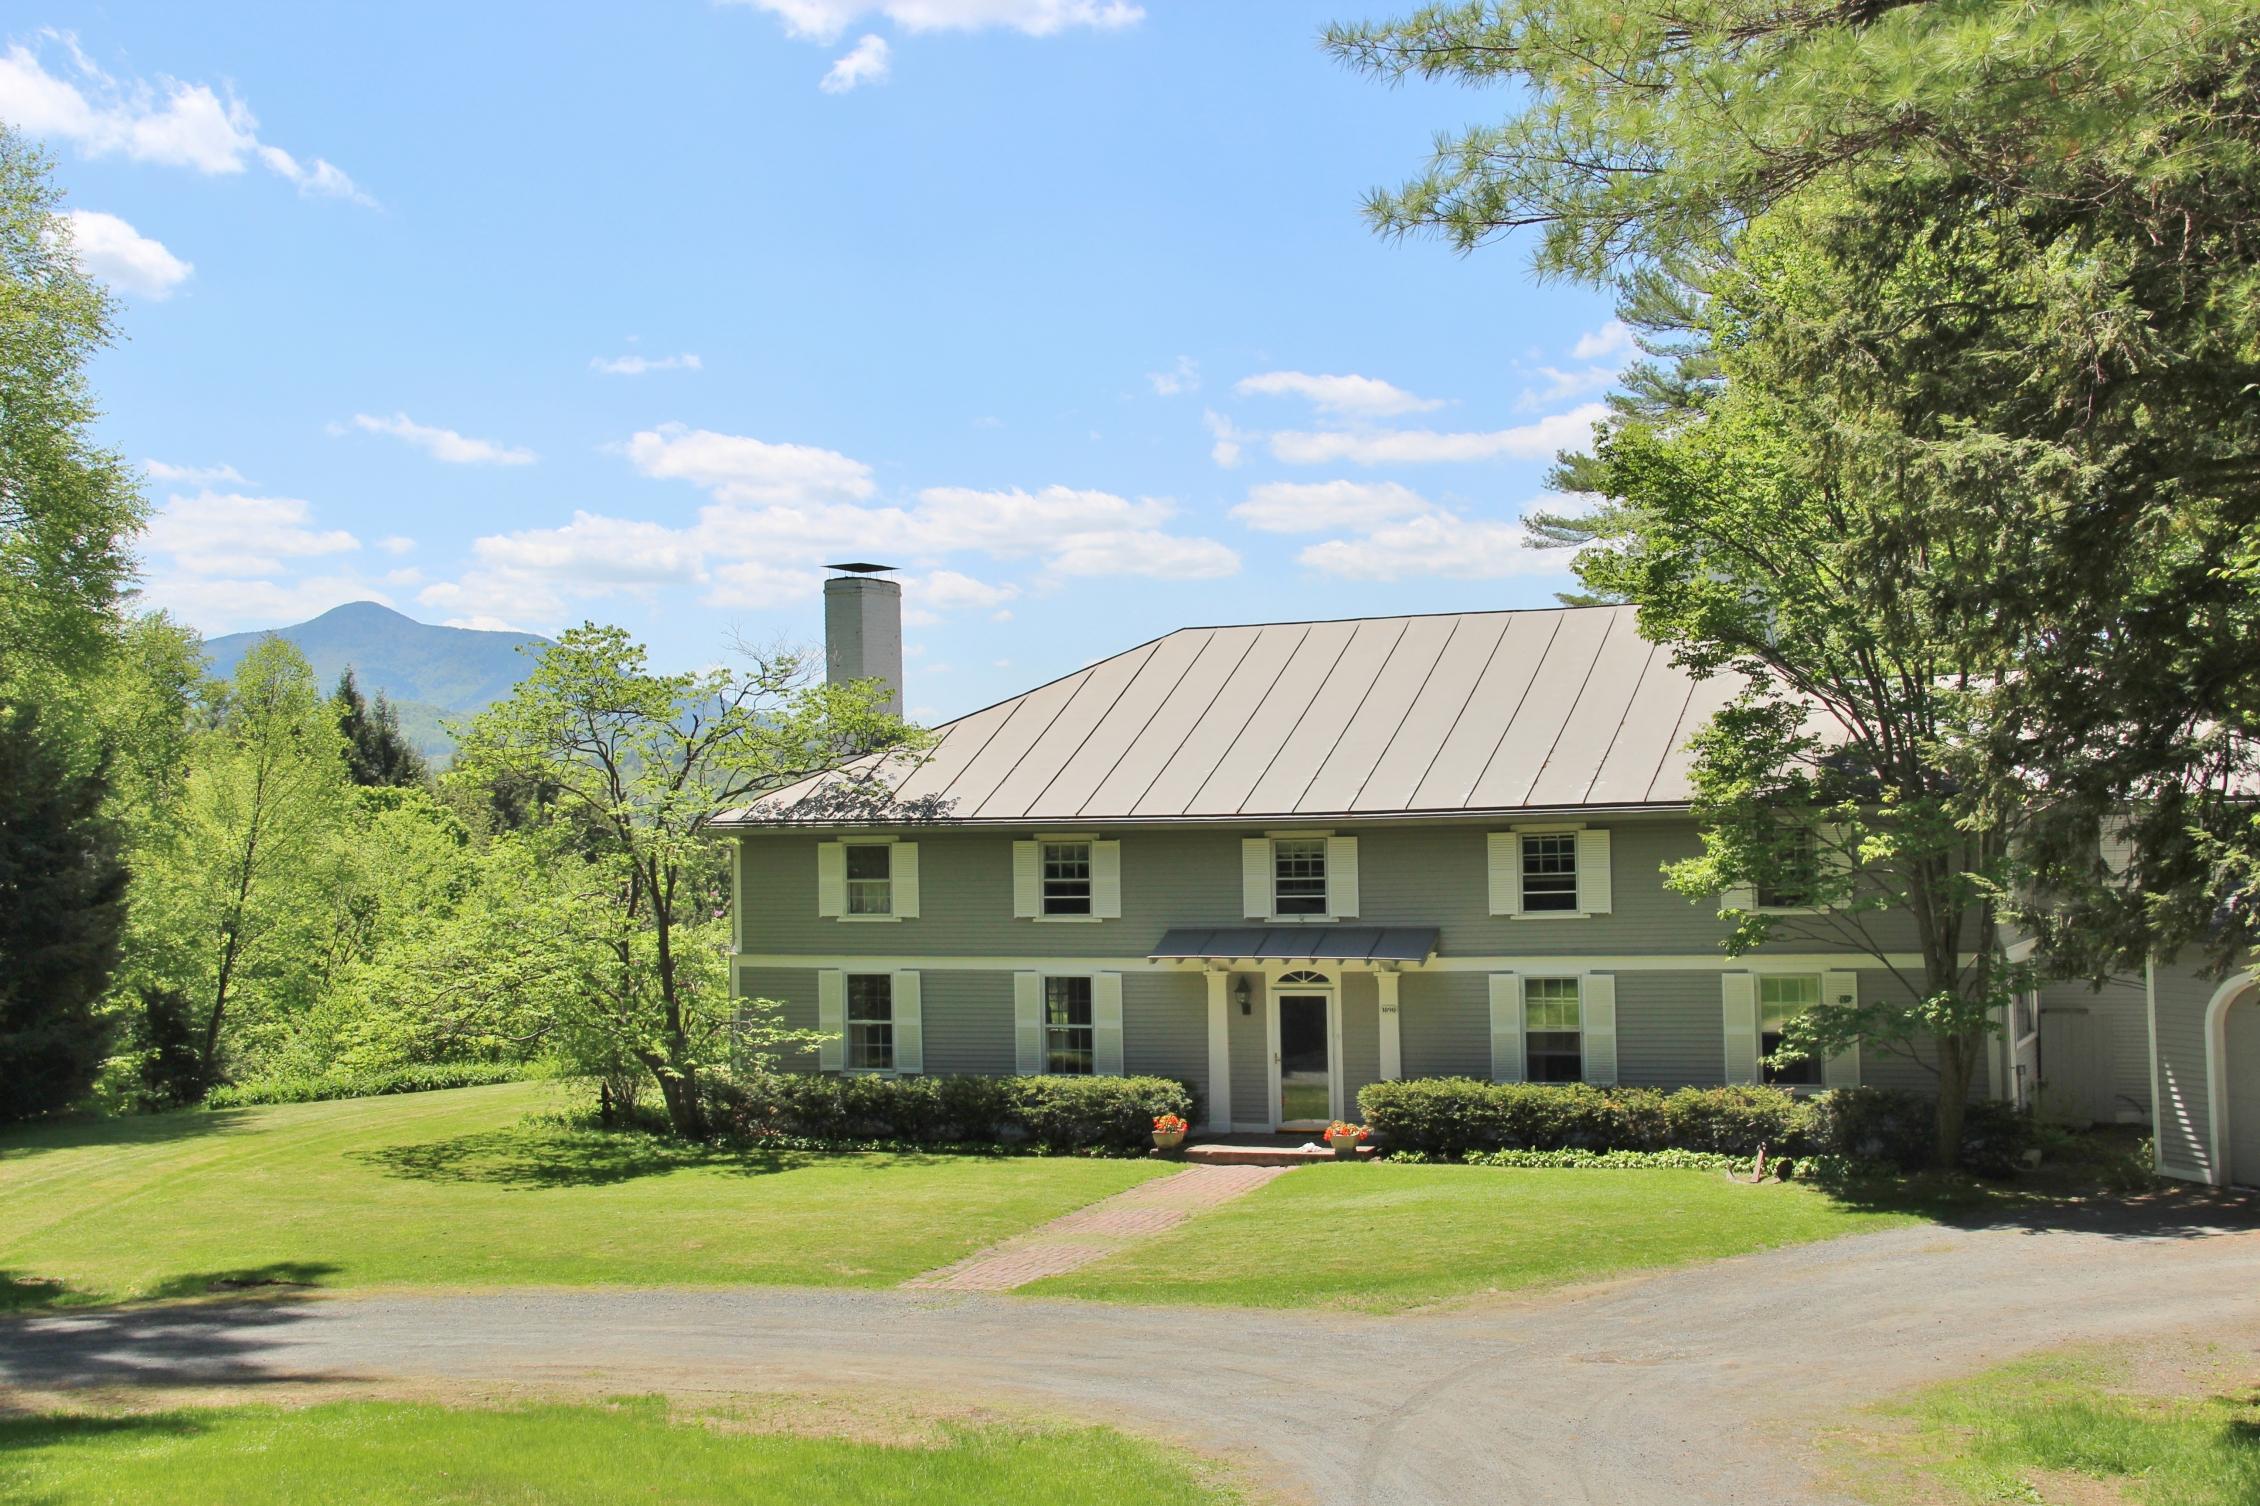 Single Family Home for Sale at 193 Platt Rd, Cornish Cornish, New Hampshire, 03745 United States